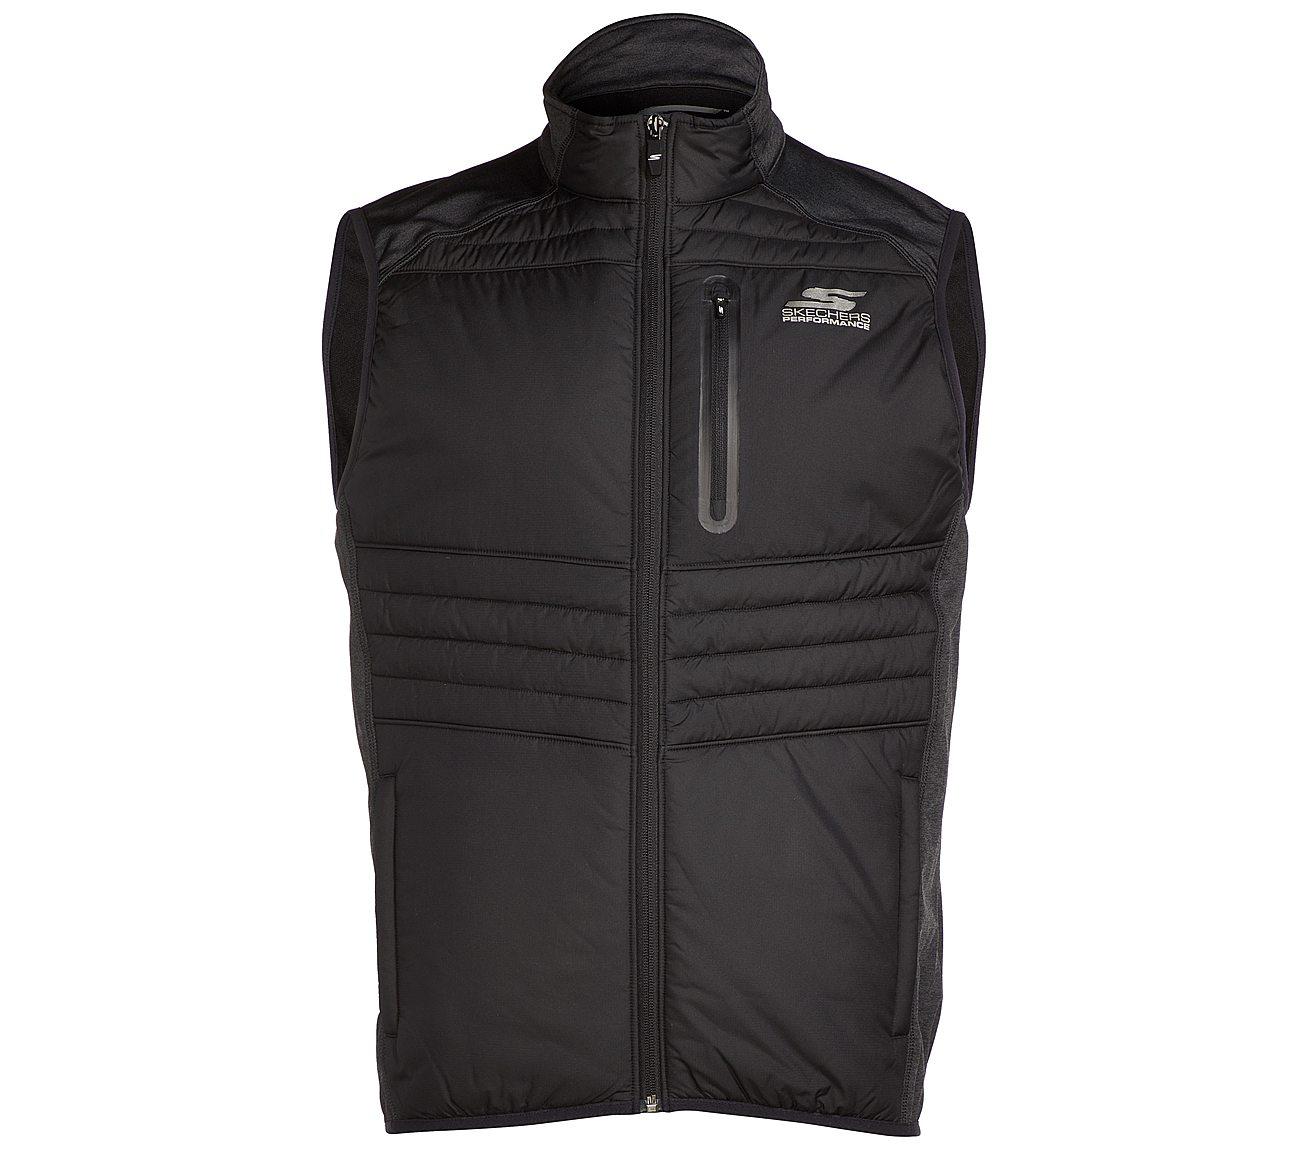 Trails Hybrid Vest